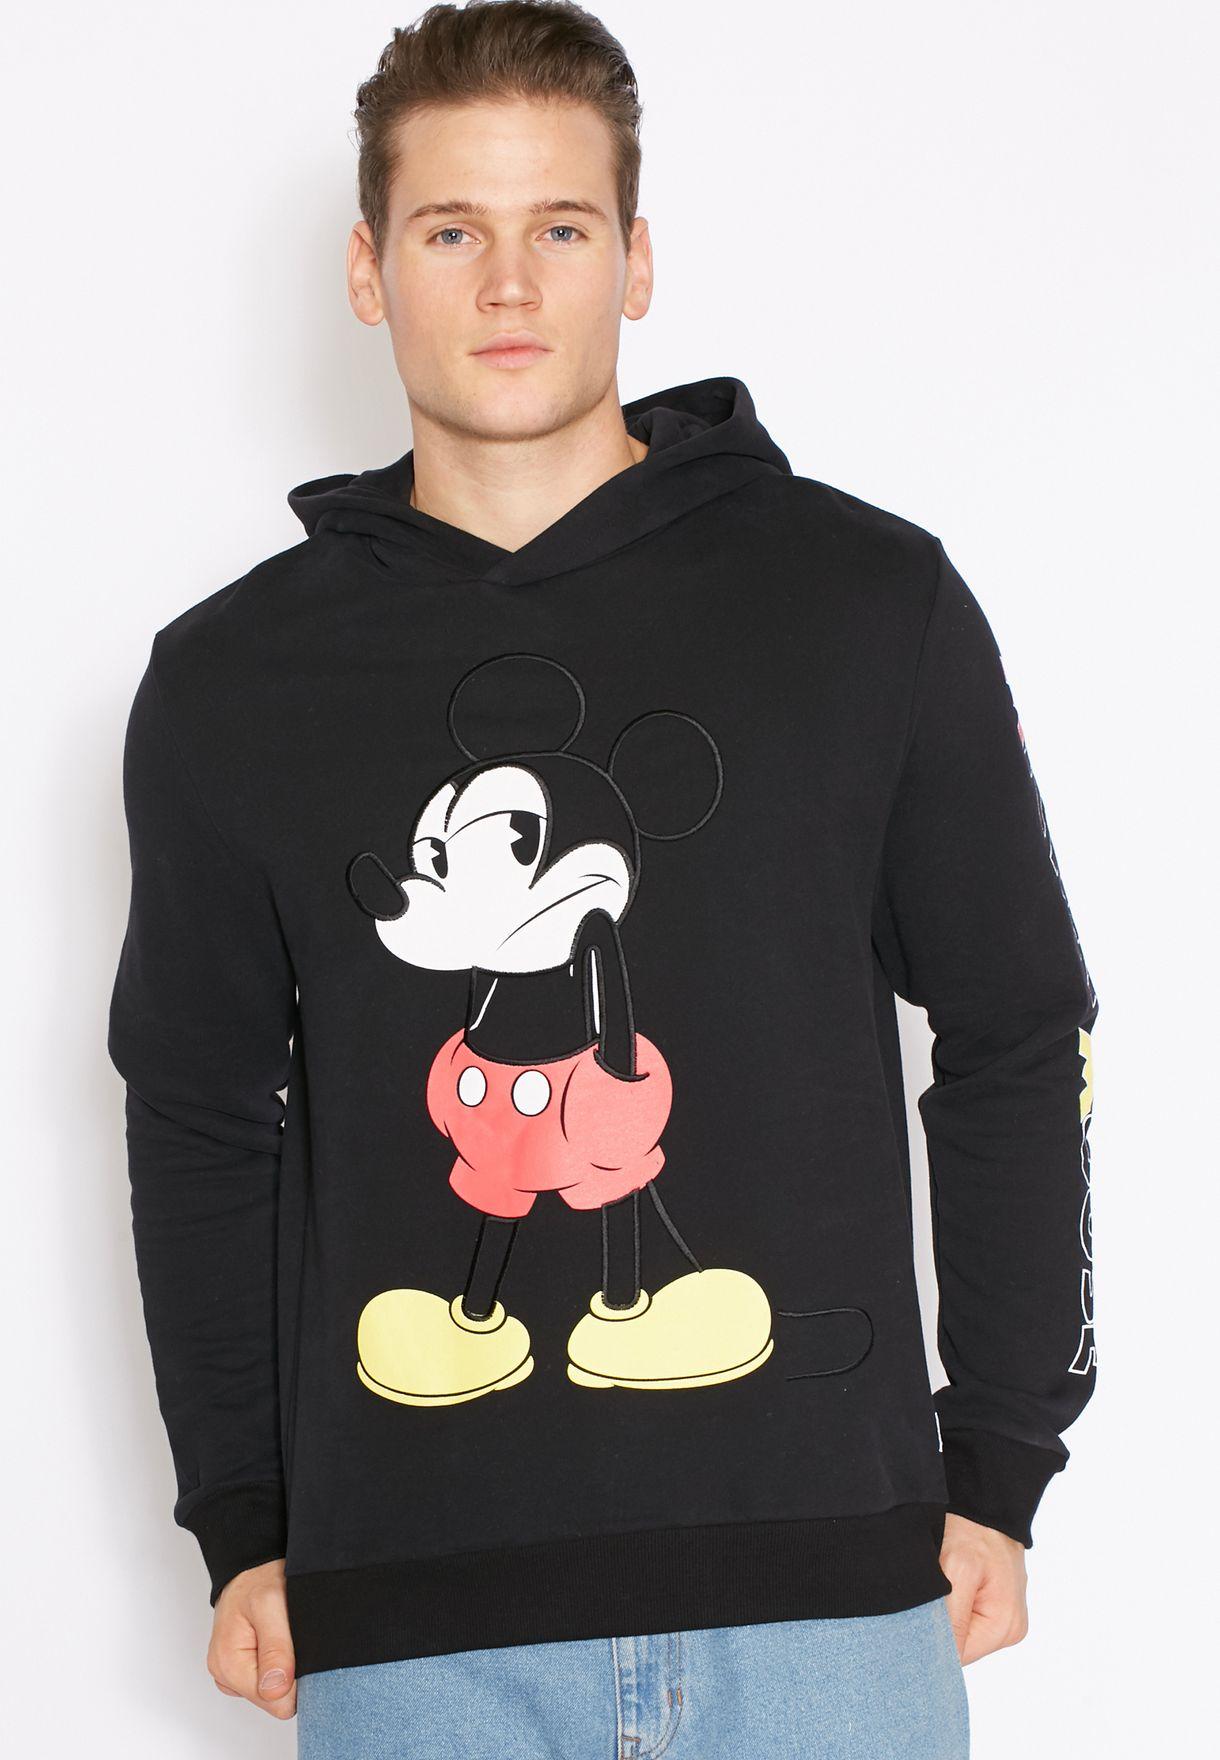 cba091c29 Shop Topman black Mickey Mouse Print Hoodie for Men in Qatar ...